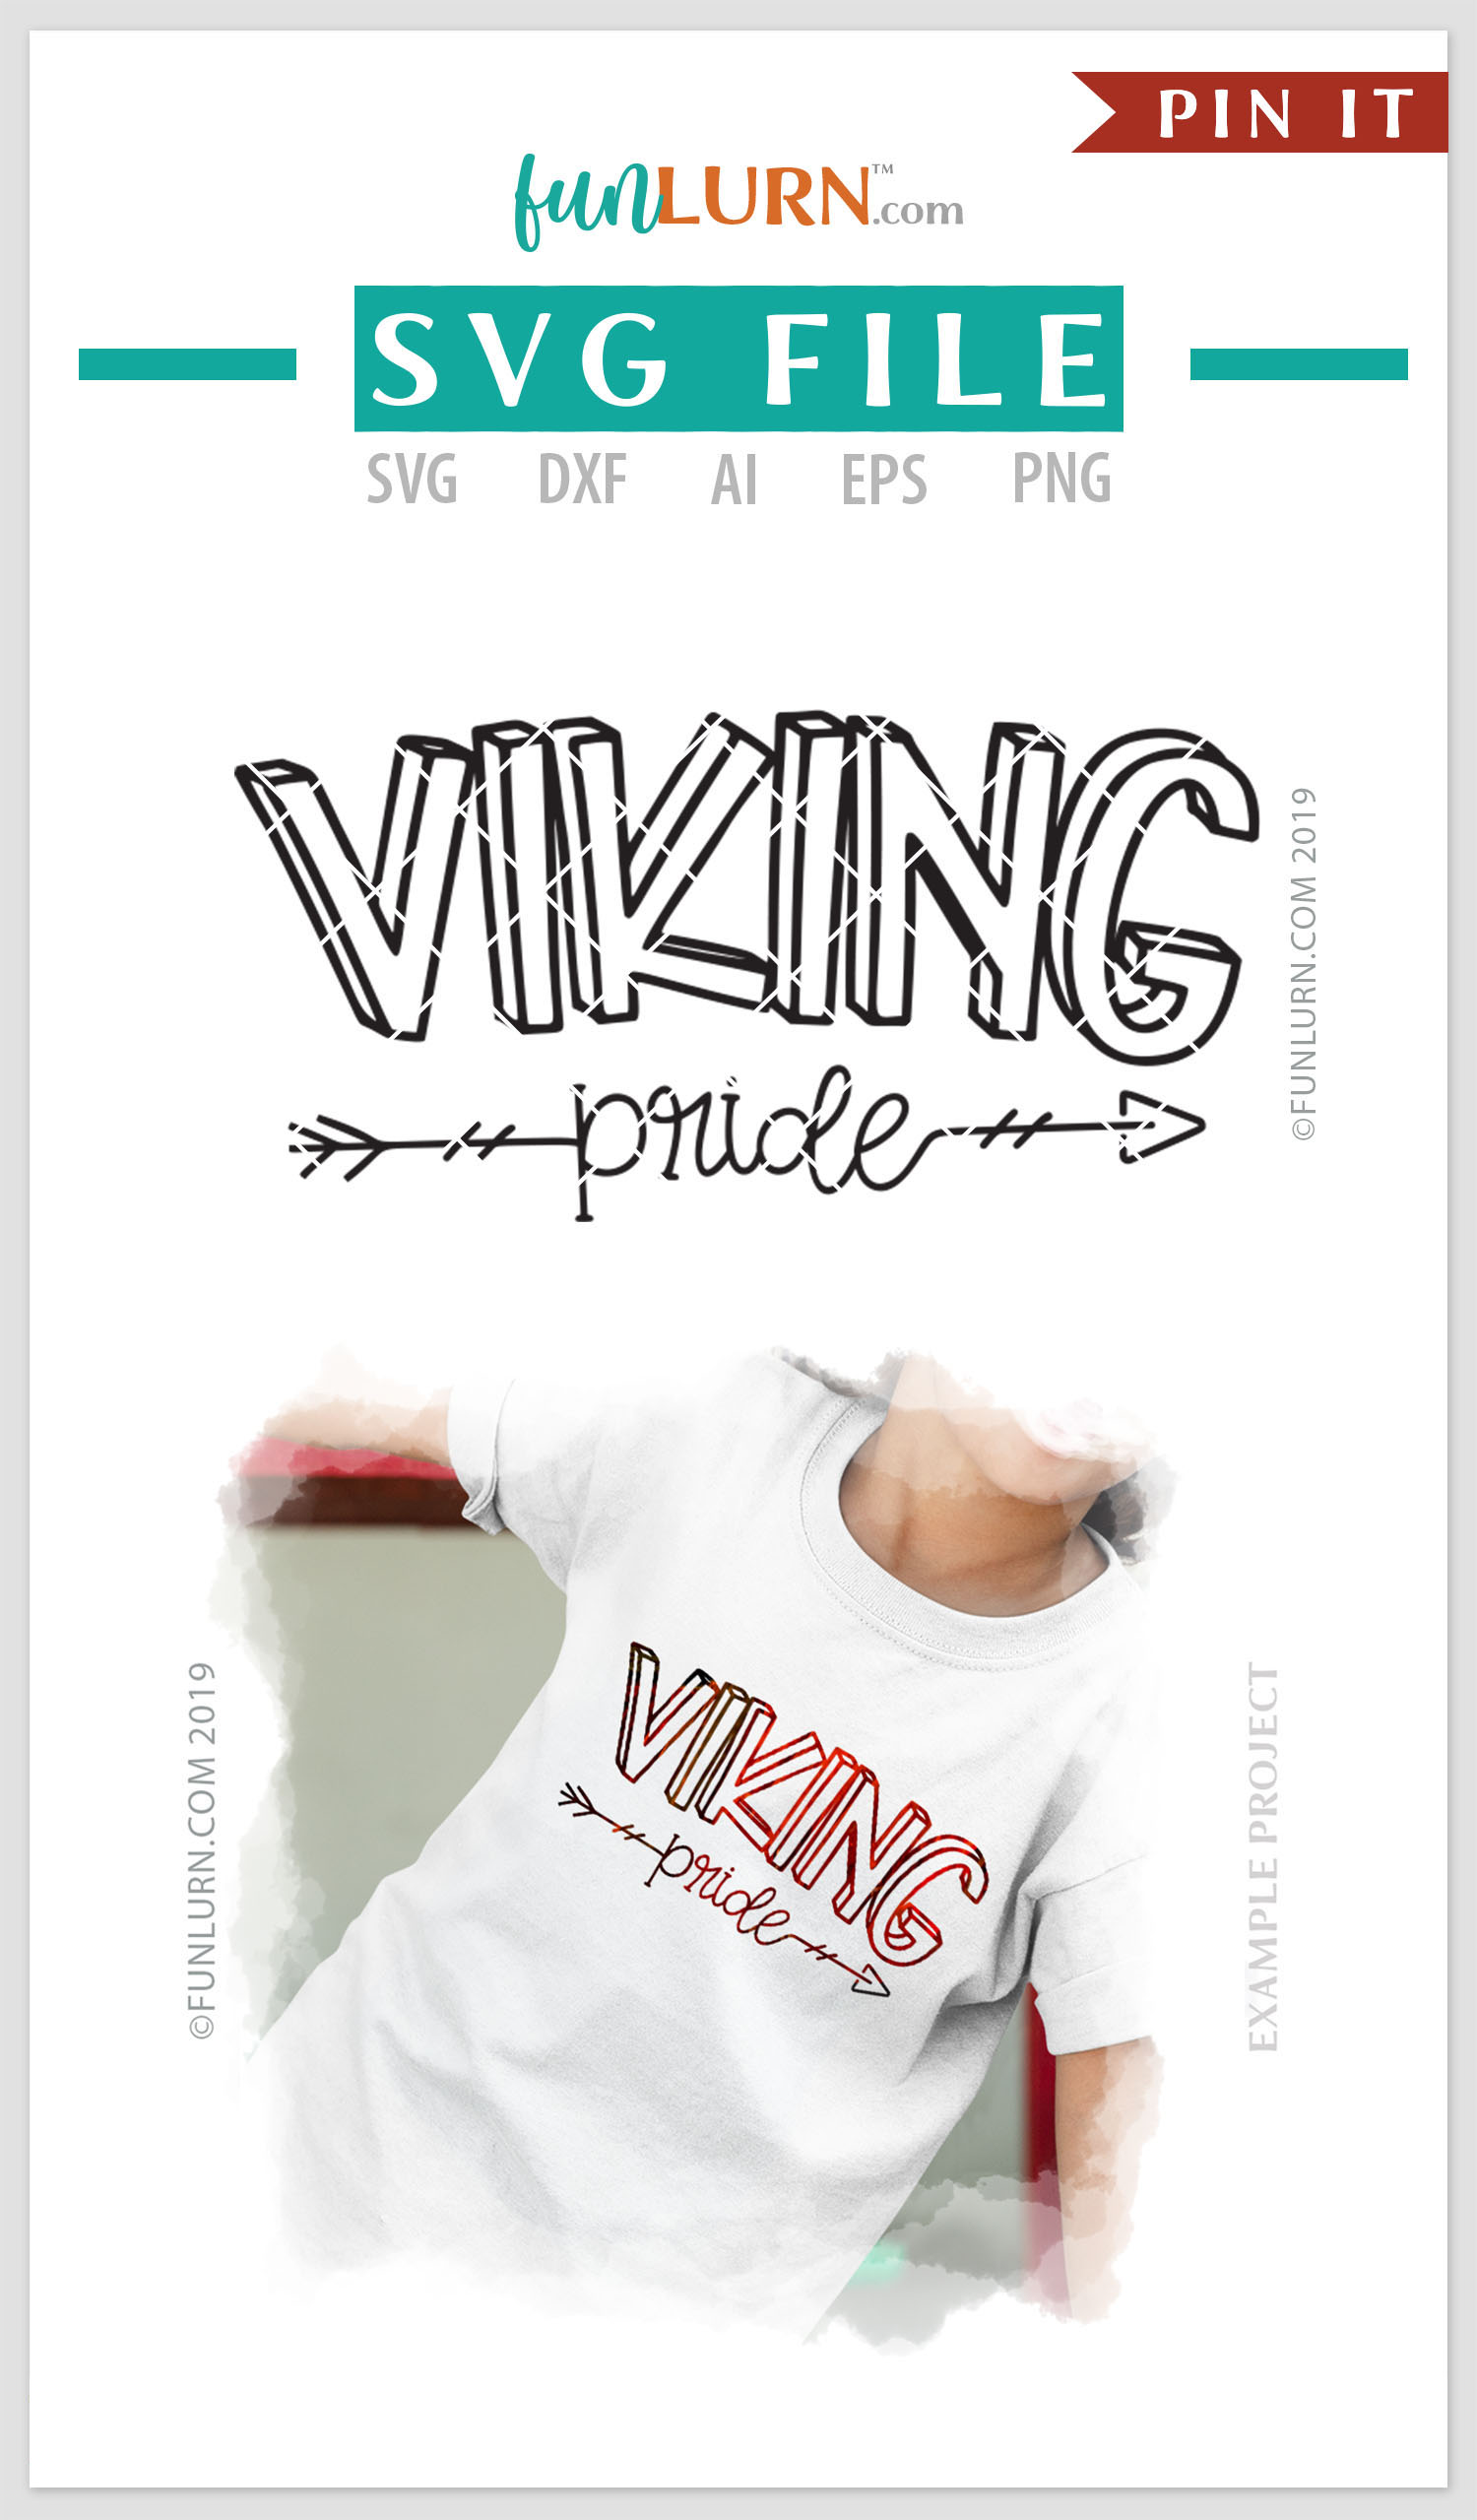 Viking Pride Team SVG Cut File example image 4